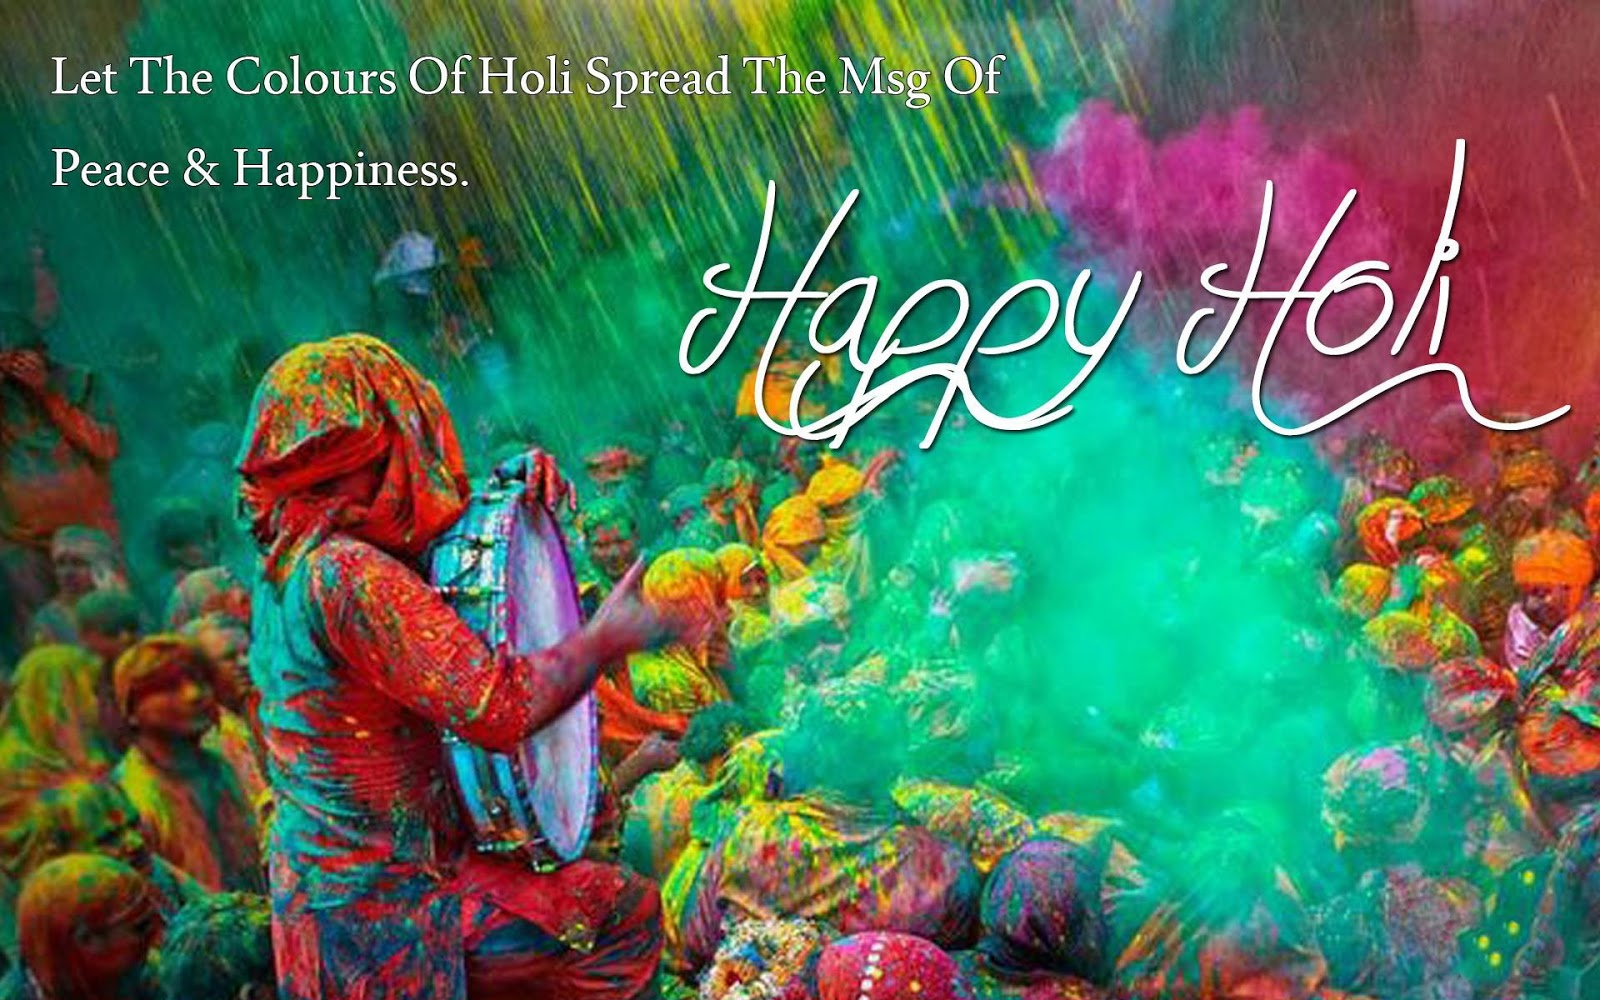 Happy holi whatsapp sms and status